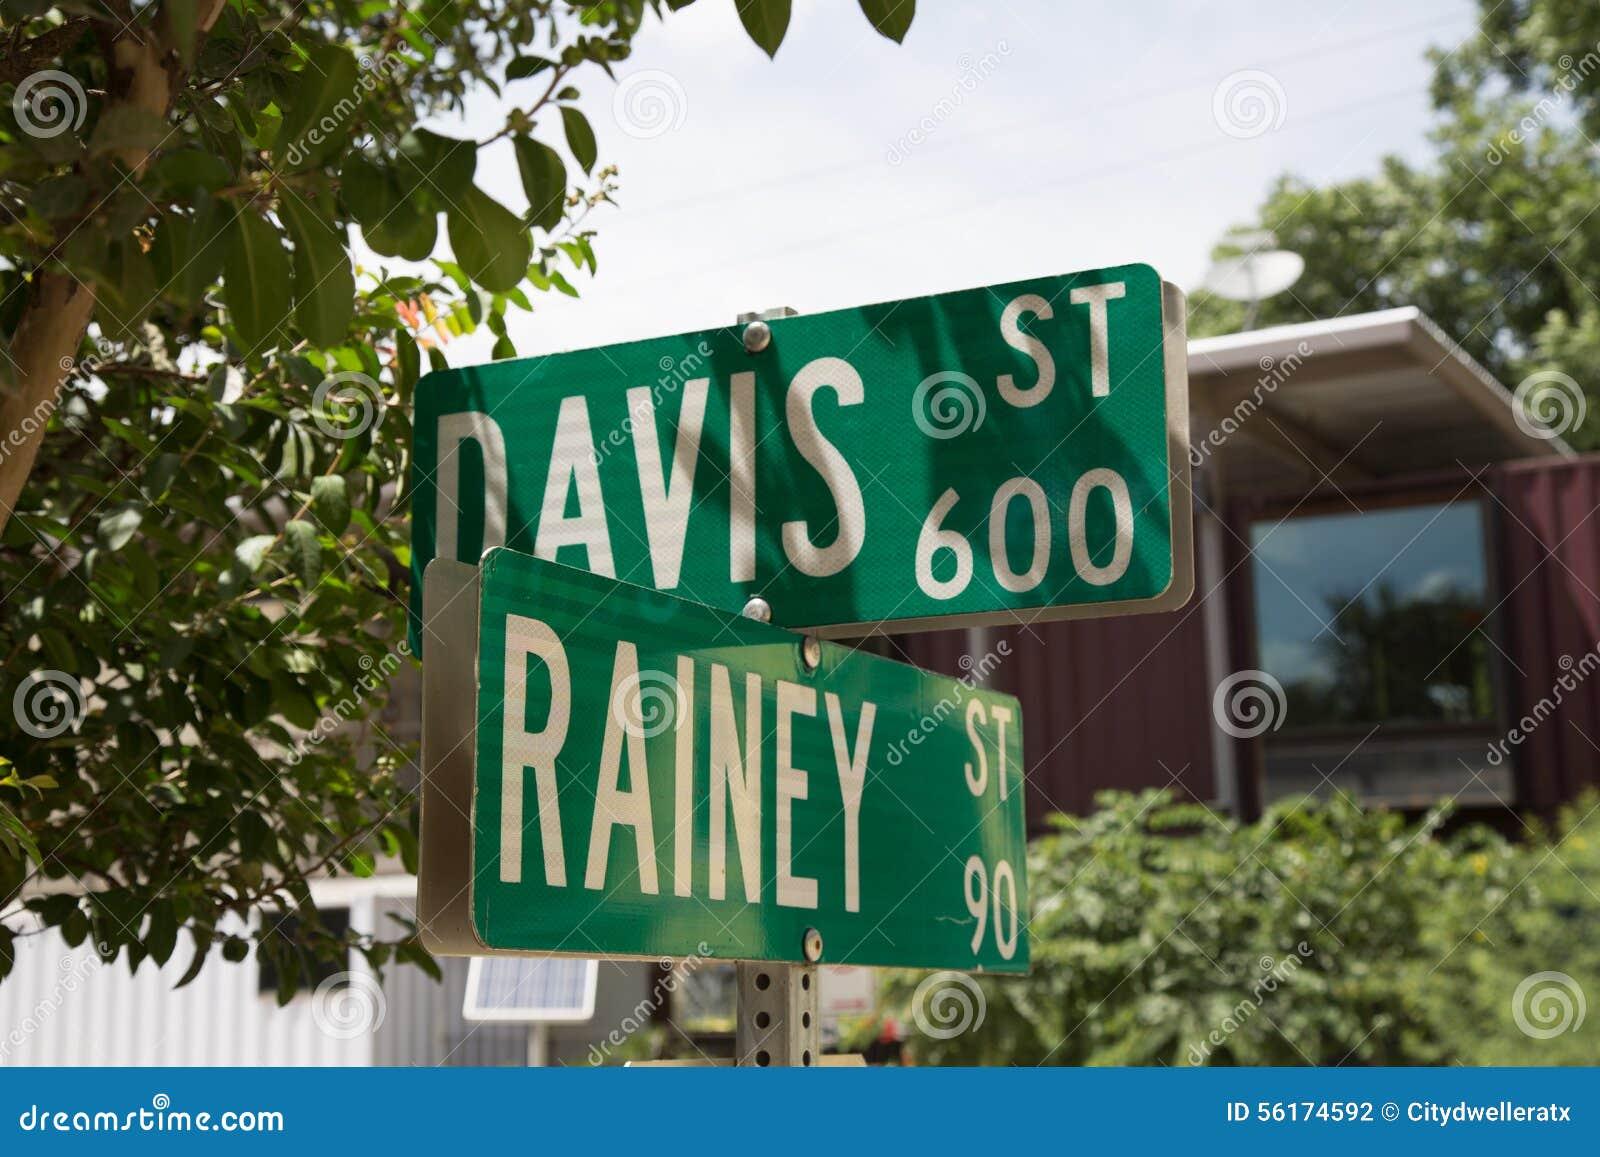 Rainey Street Austin Texas